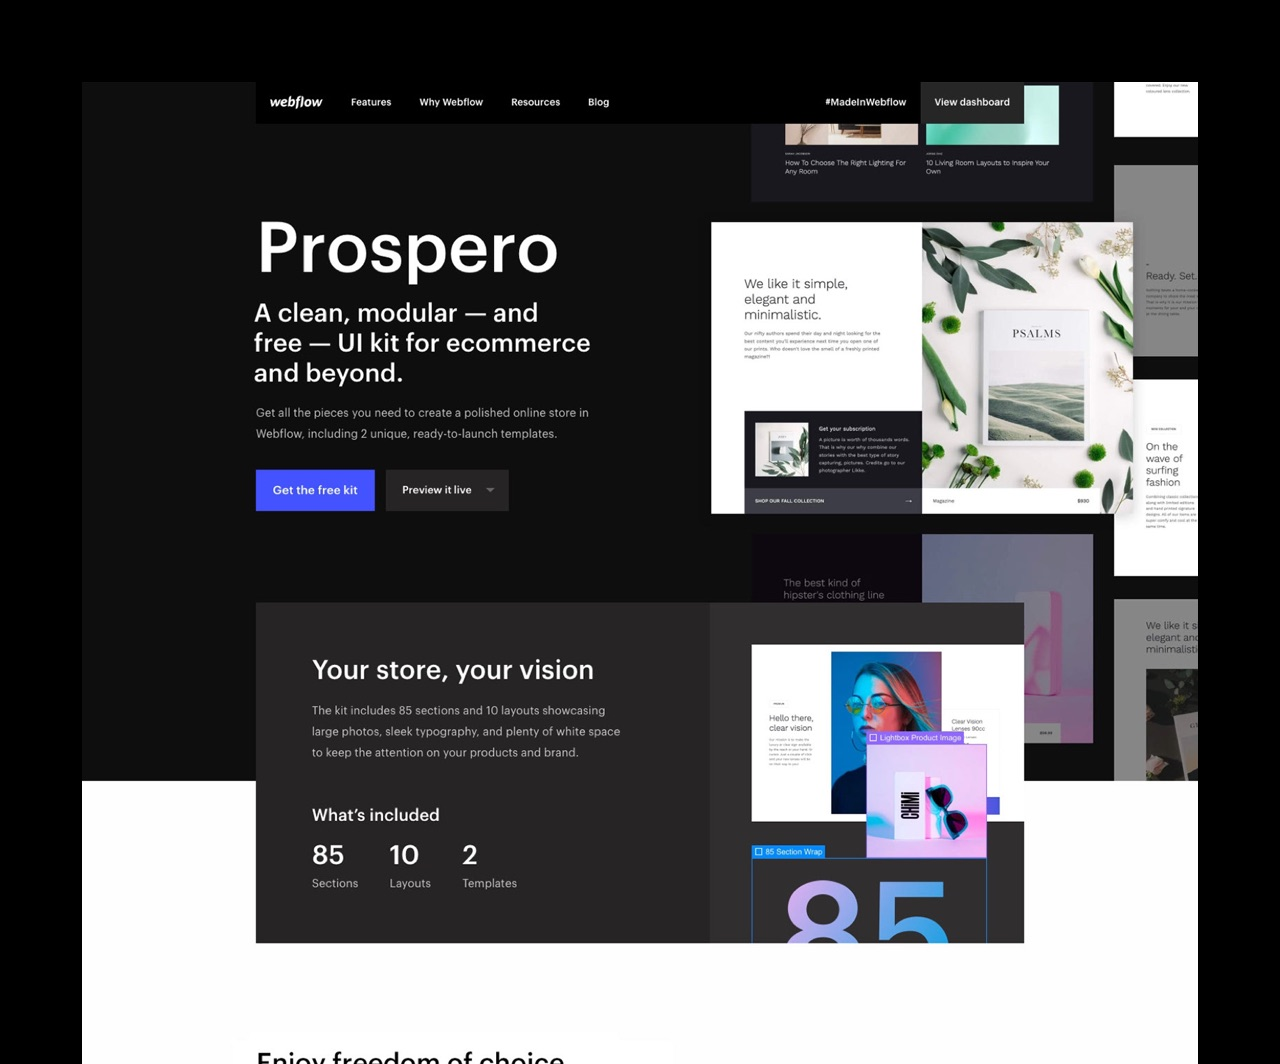 Prospero UI Kit - Jan Losert - First official Webflow UI Kit